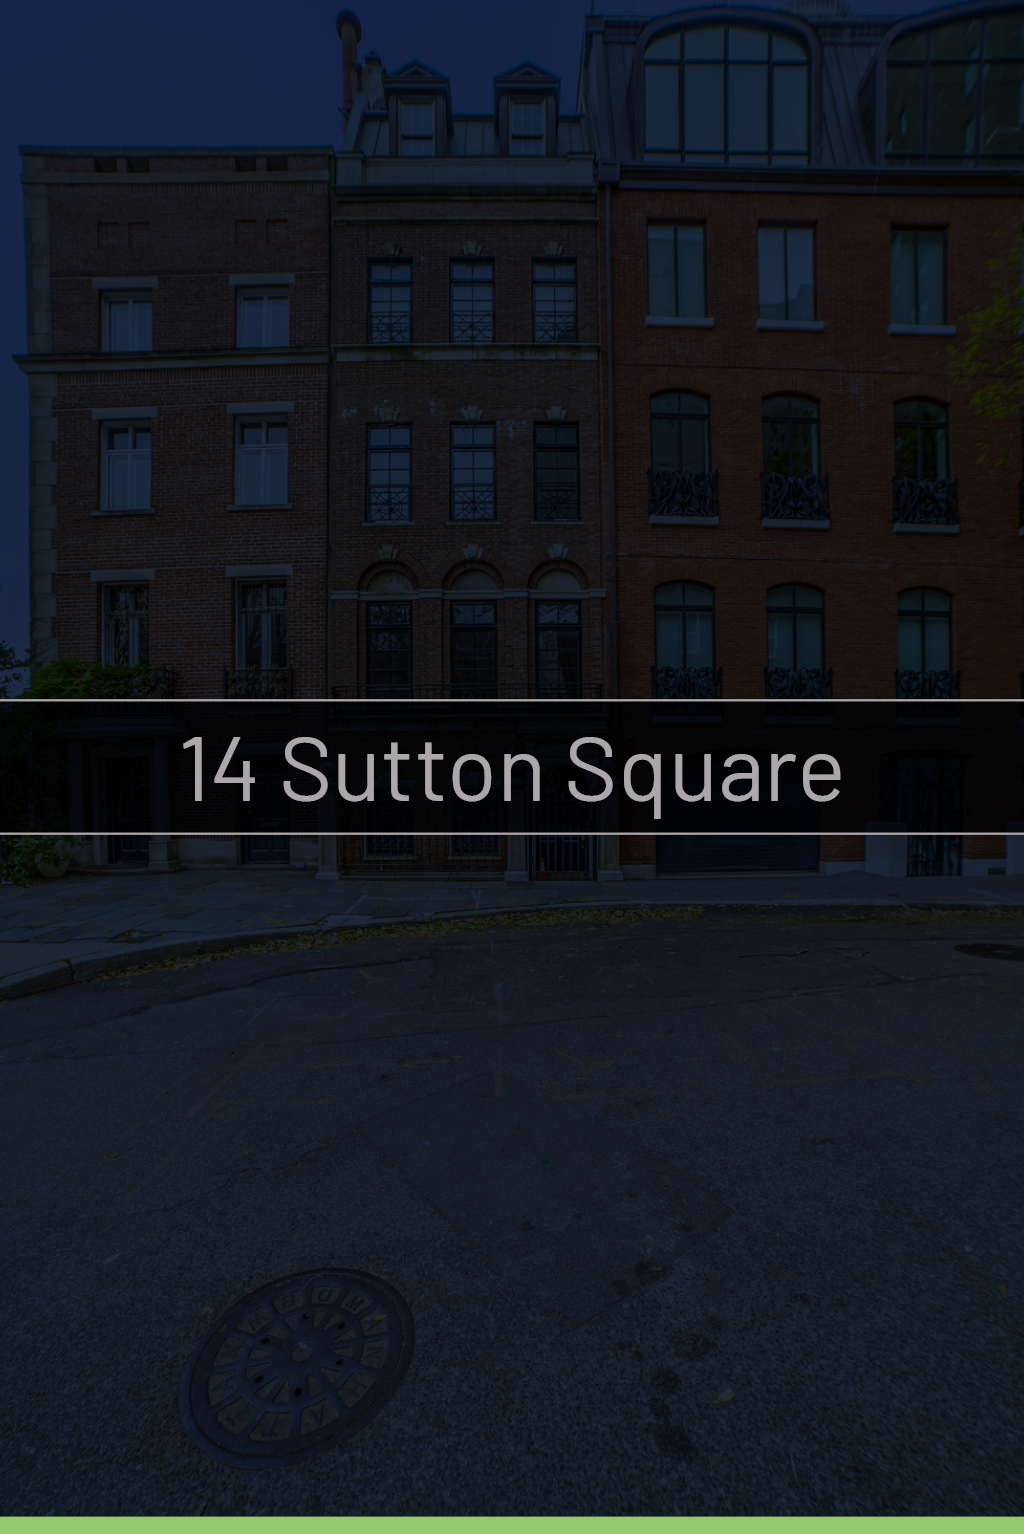 14SuttonSquare(house)